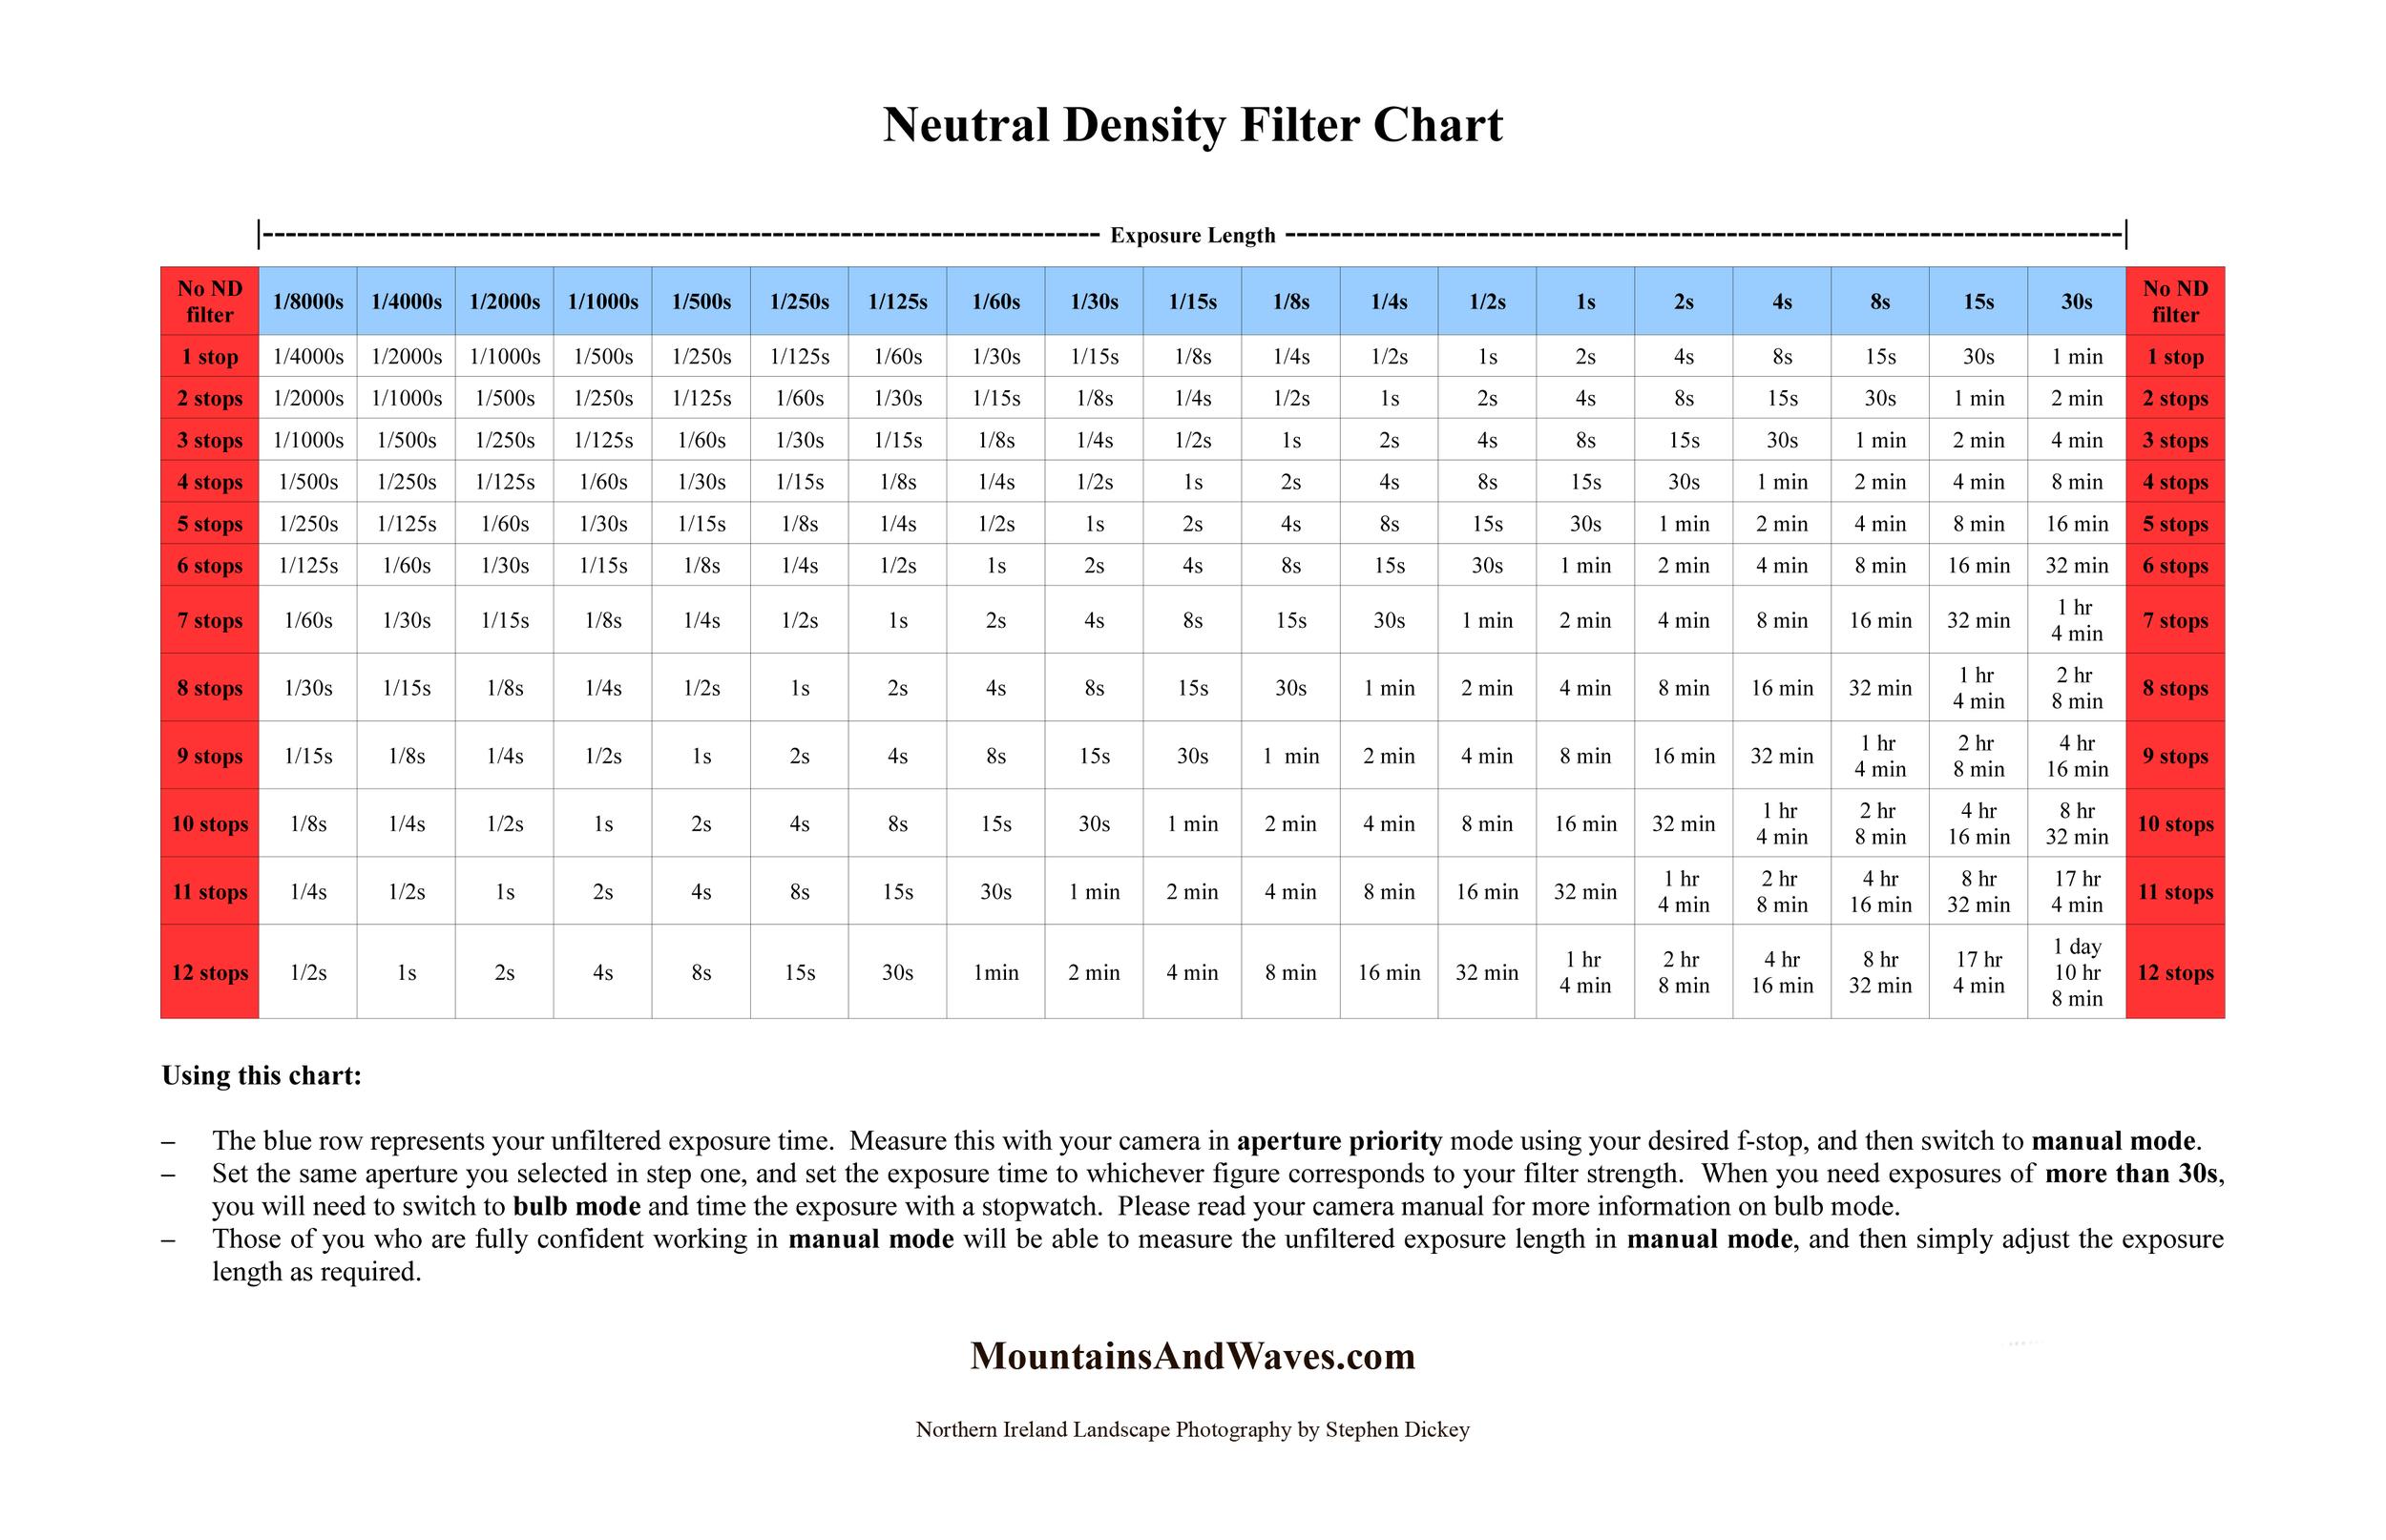 neutral-density-filter-chart-landscape-photography